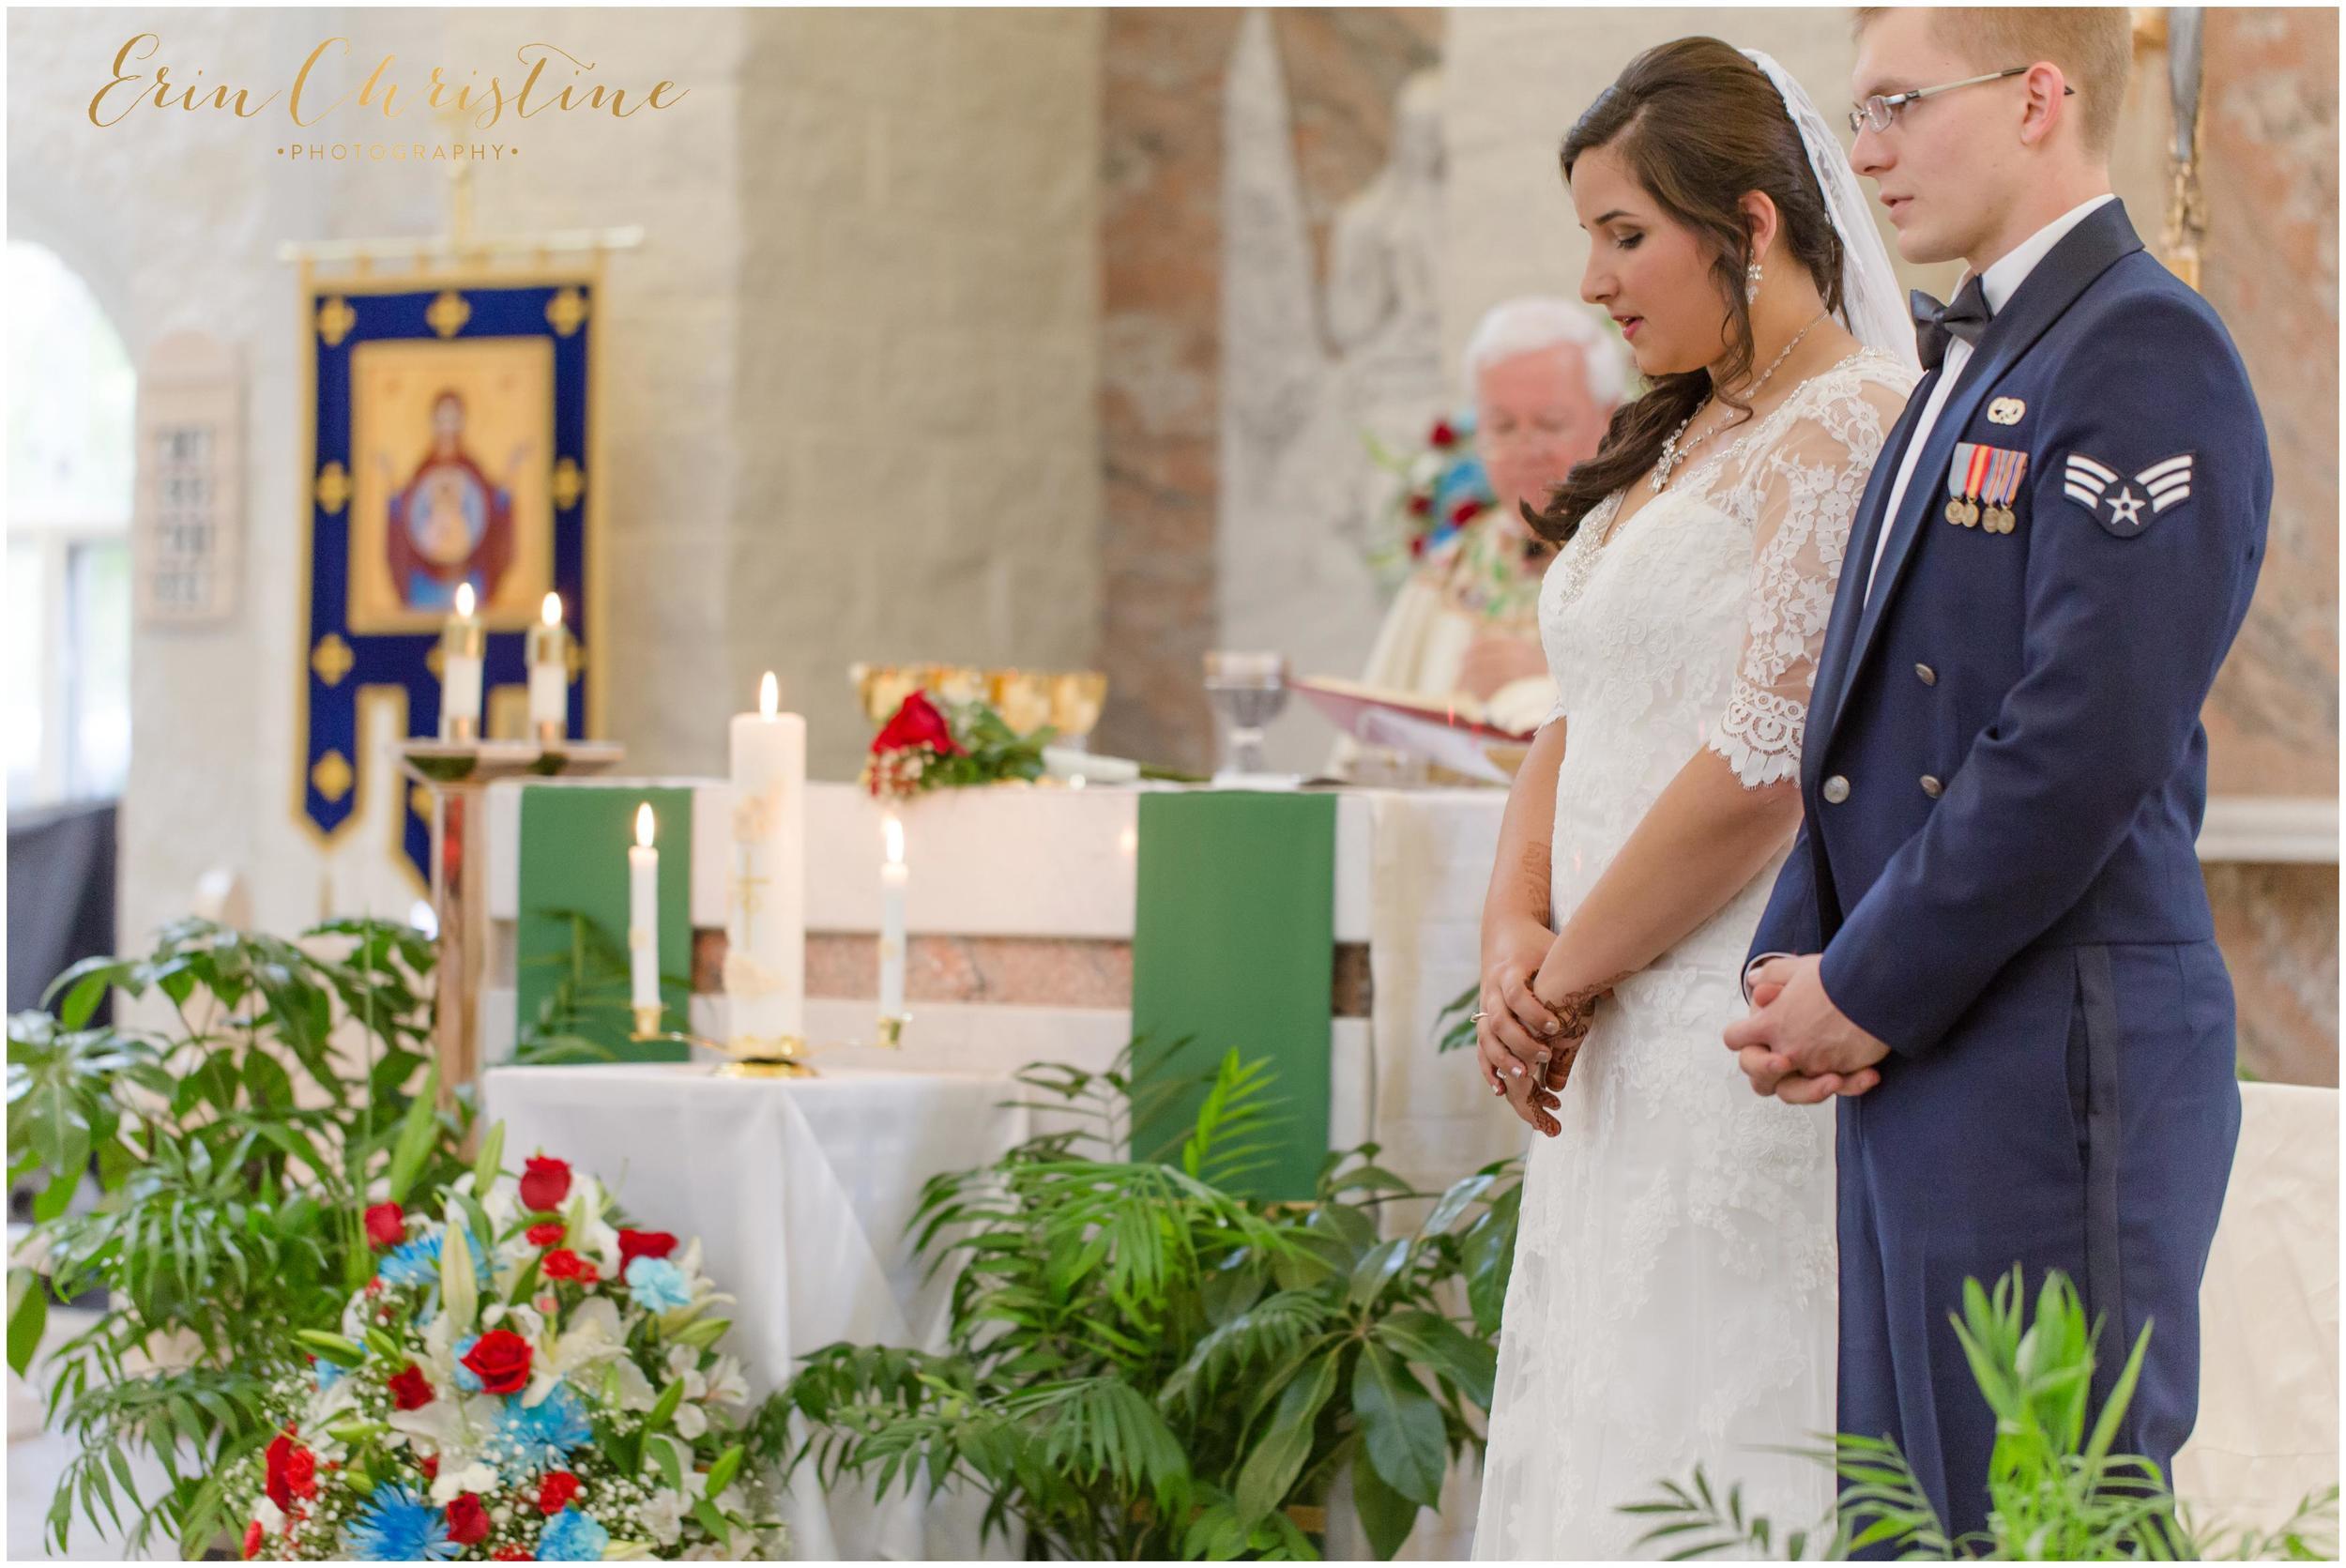 Catholic Ceremony Jesus The Good Shephered-9091.jpg